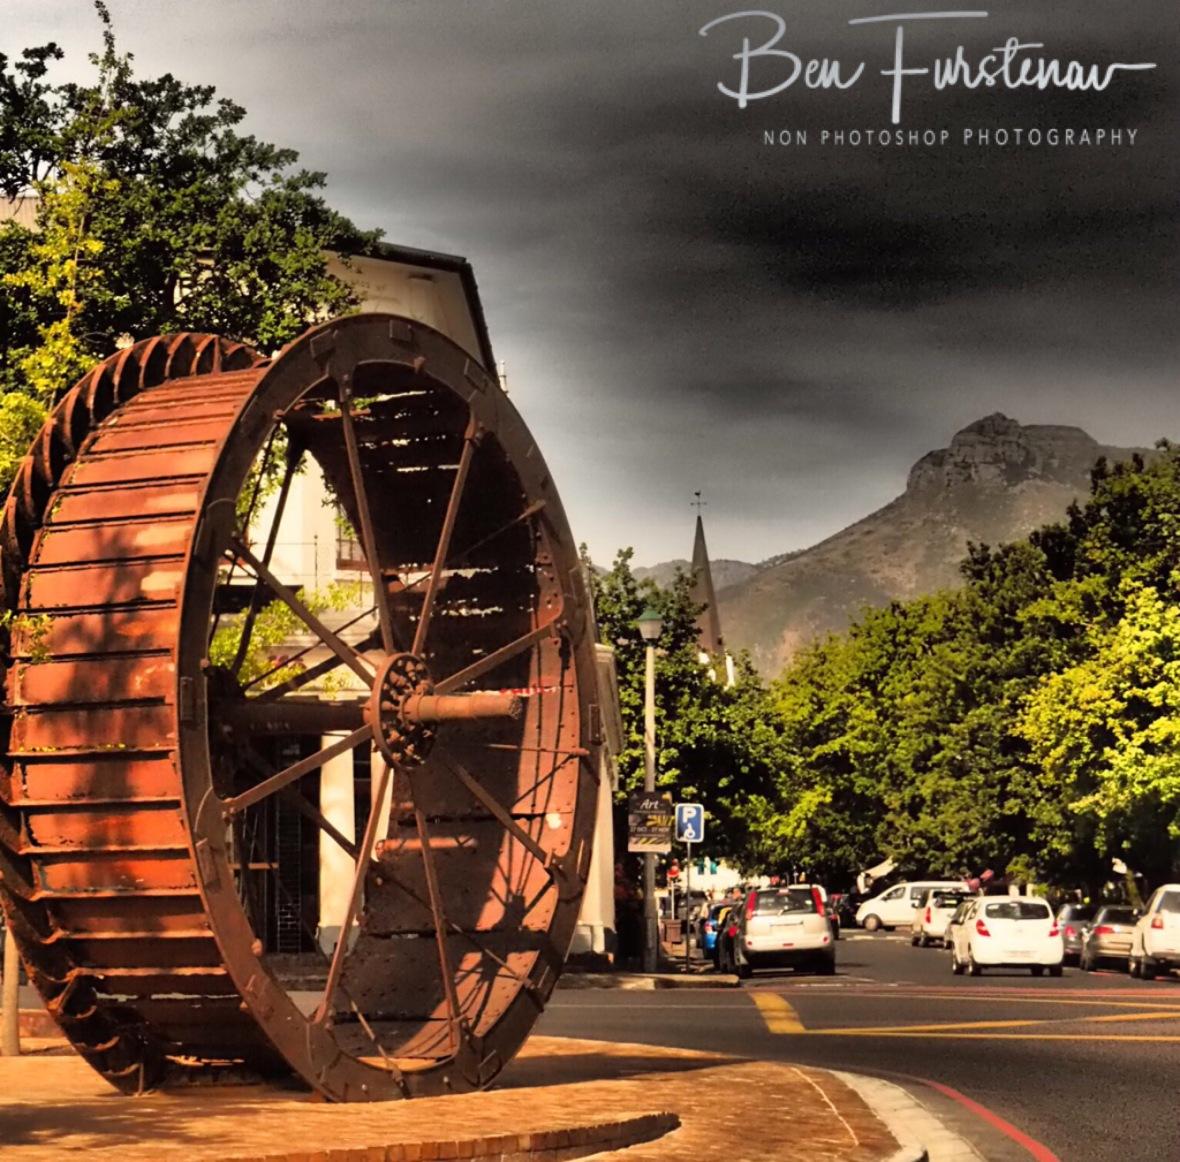 City centre in Stellenbosch